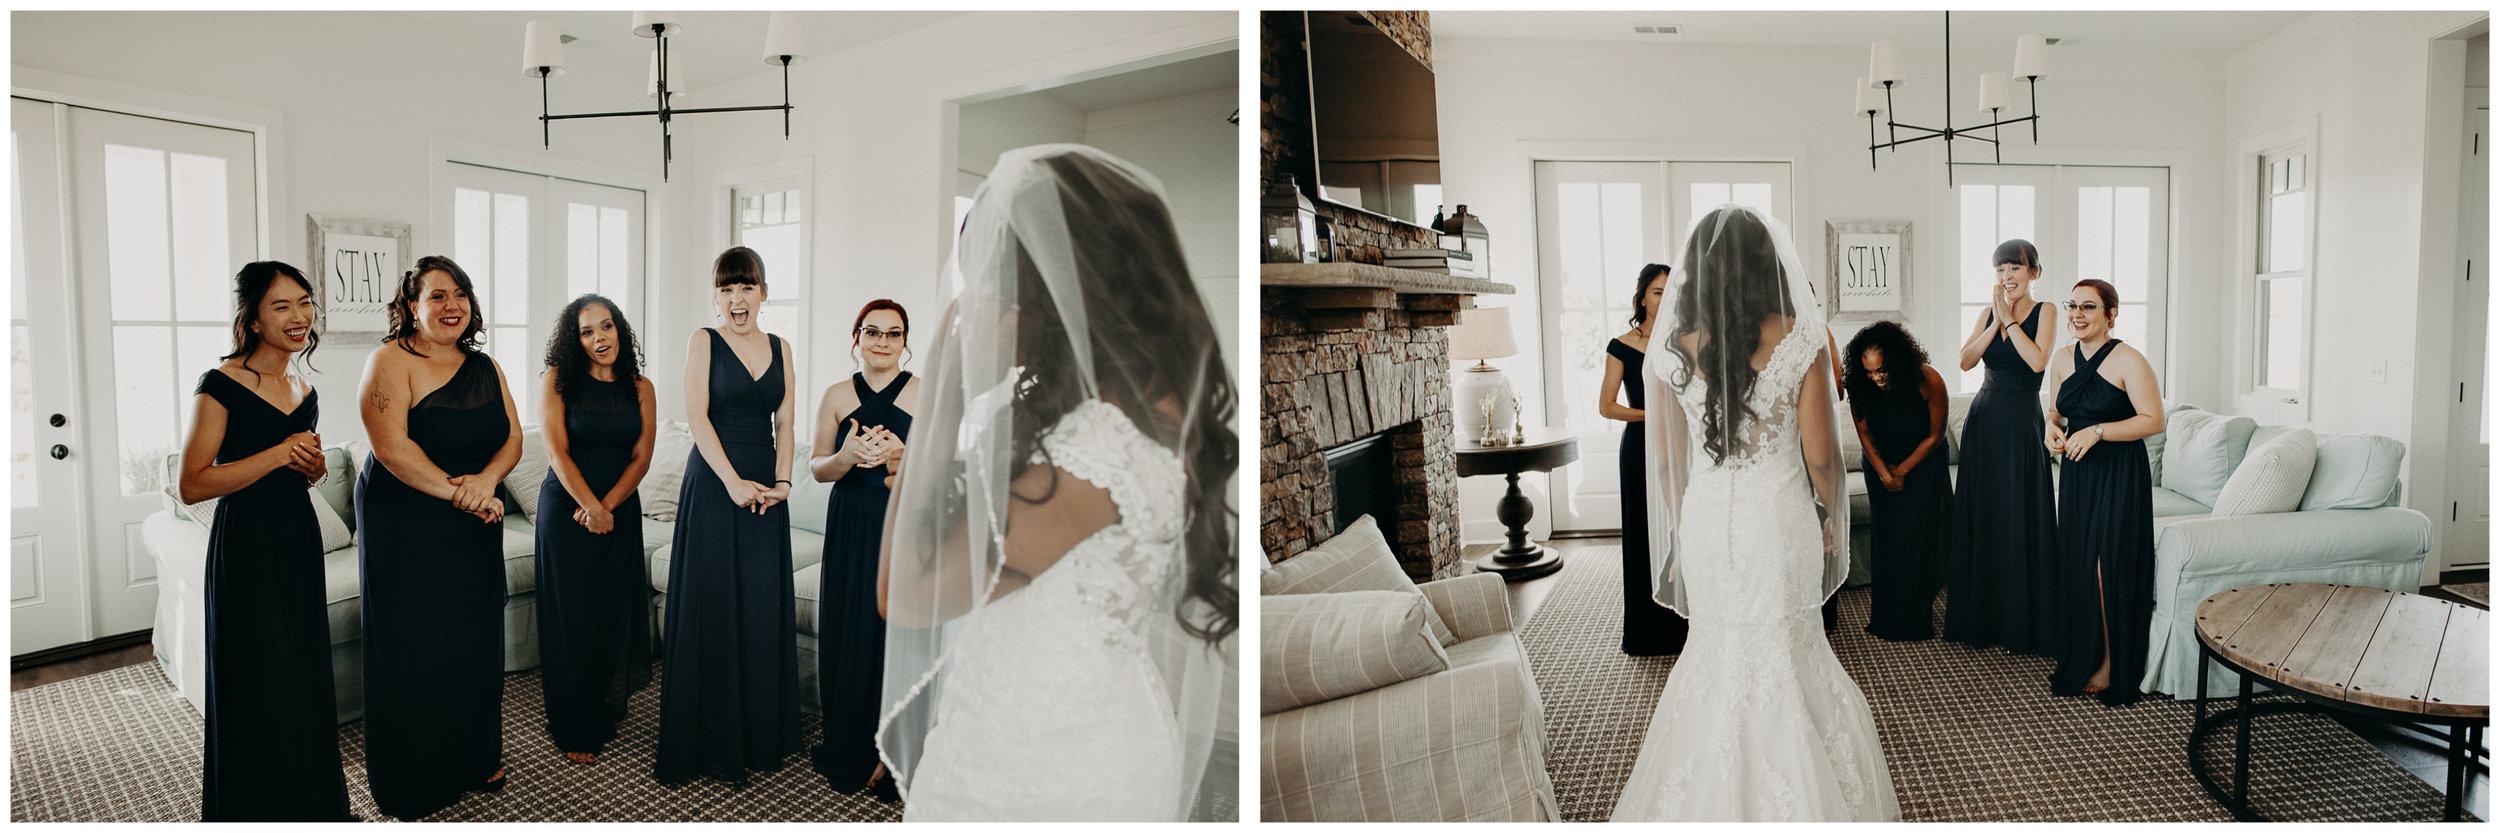 18.1- Wedding_day_atlanta_georgia_bride_details_dress_aline_marin_photography_-12.jpg